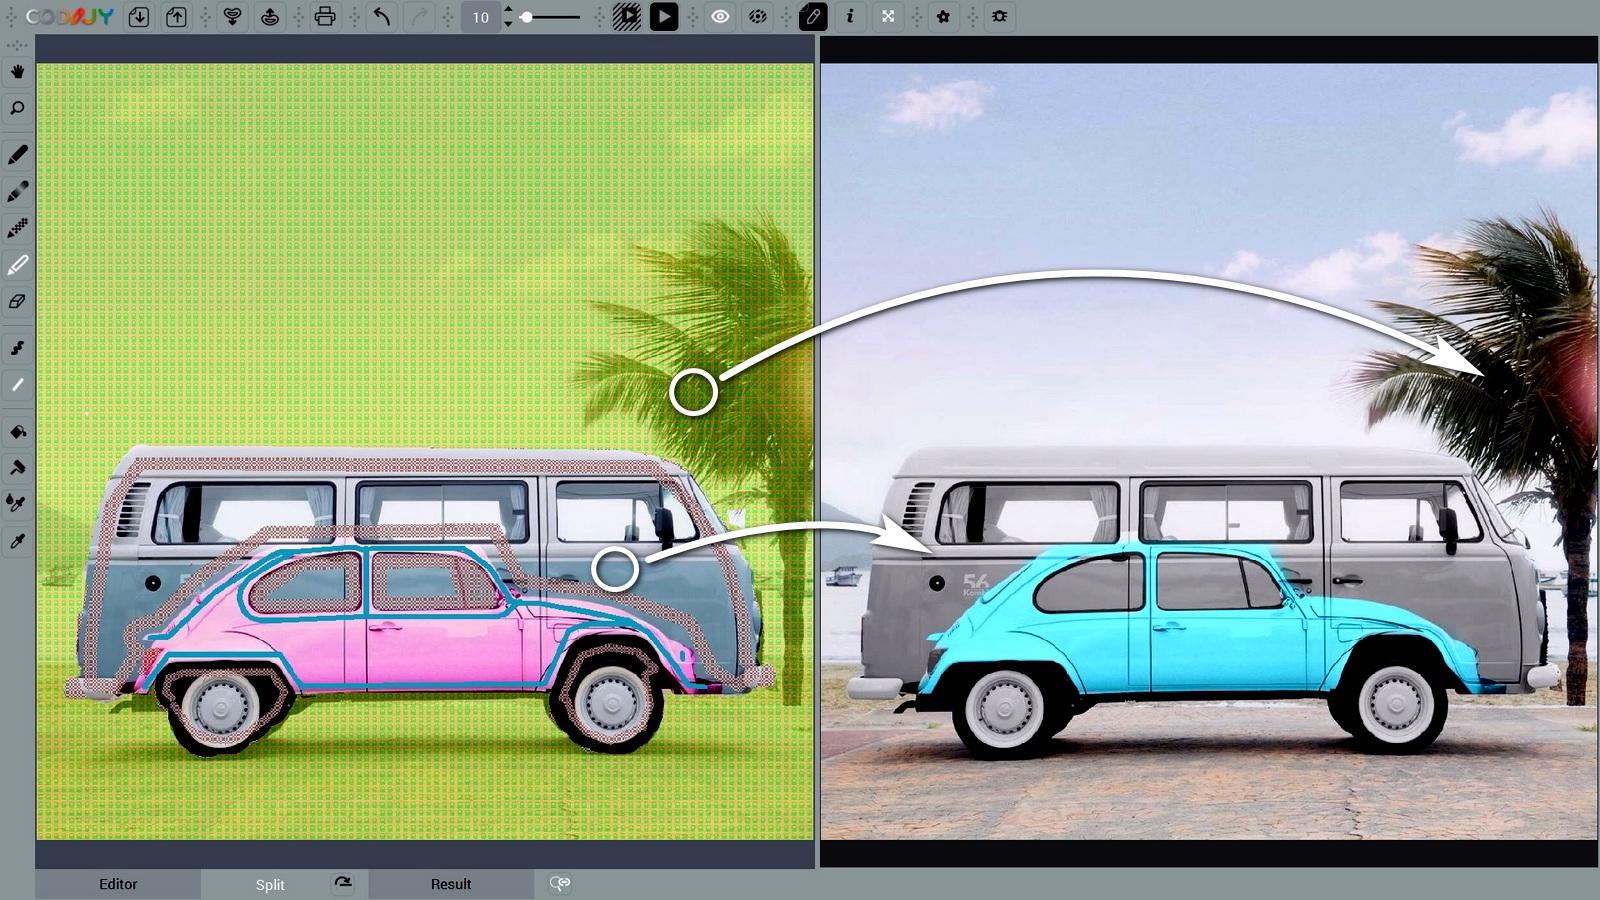 decoloring-recoloring08-1